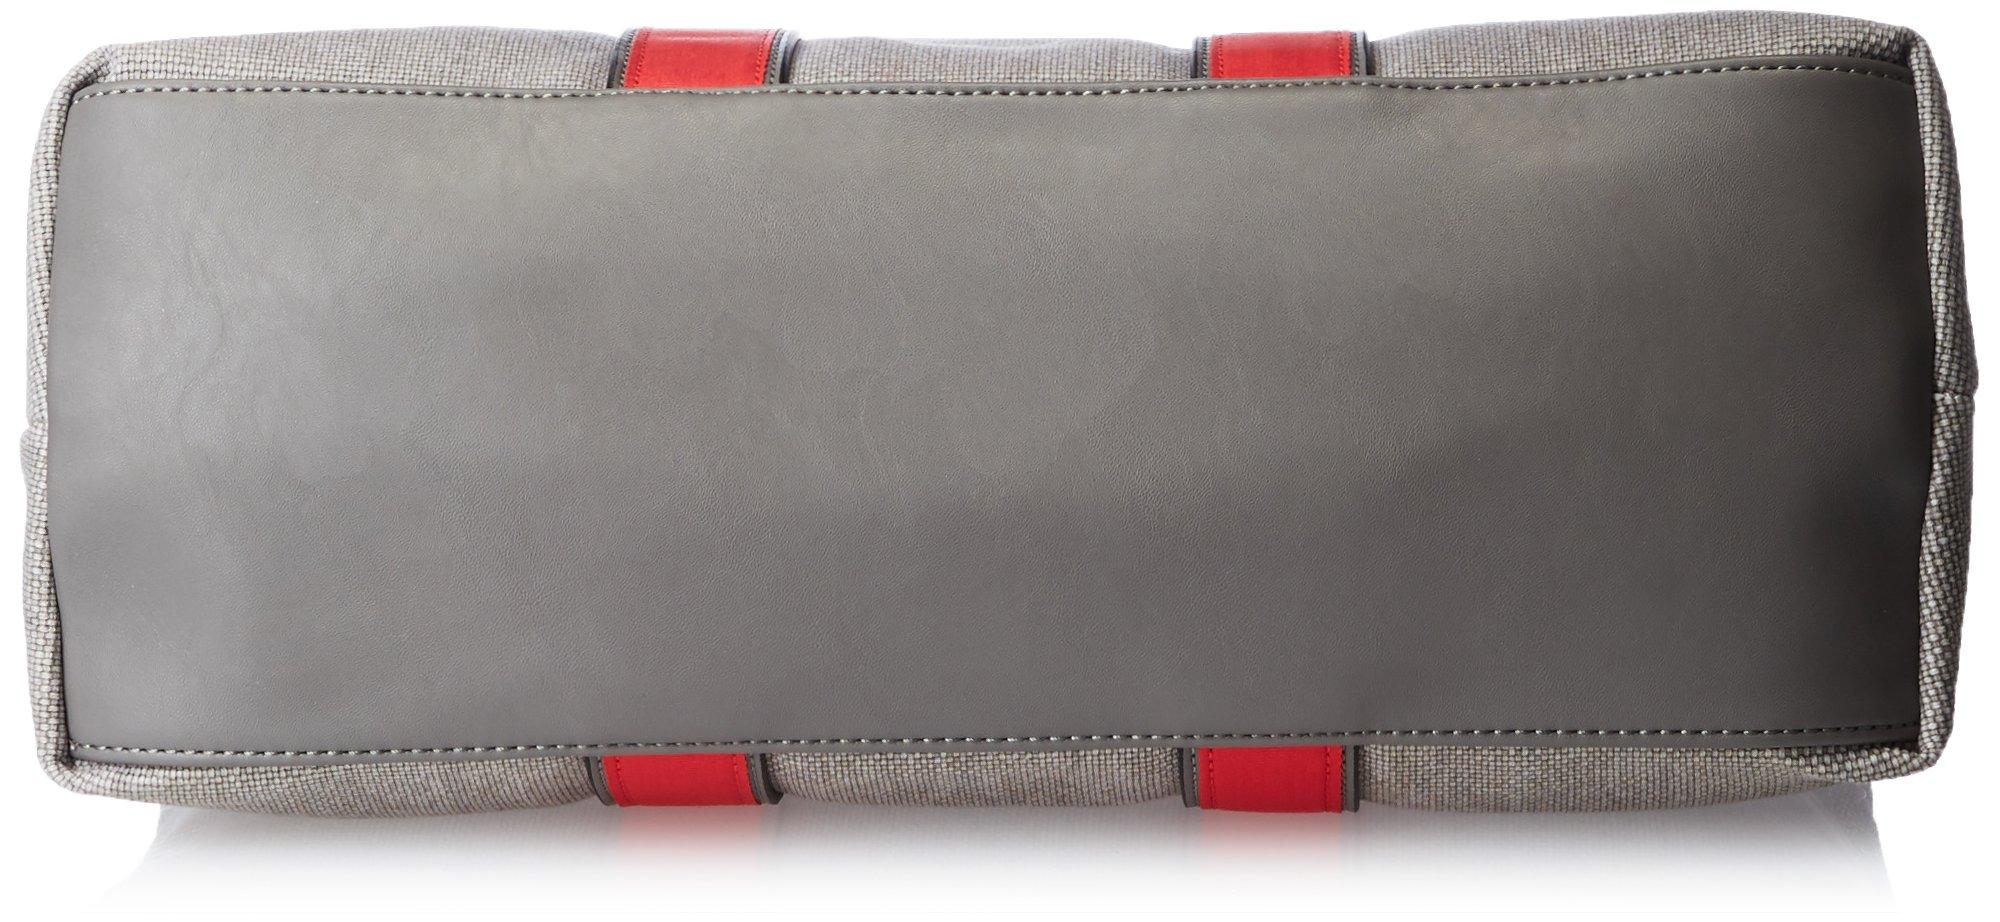 Splendid Cape May Satchel Top Handle Bag, Grey, One Size by Splendid (Image #4)